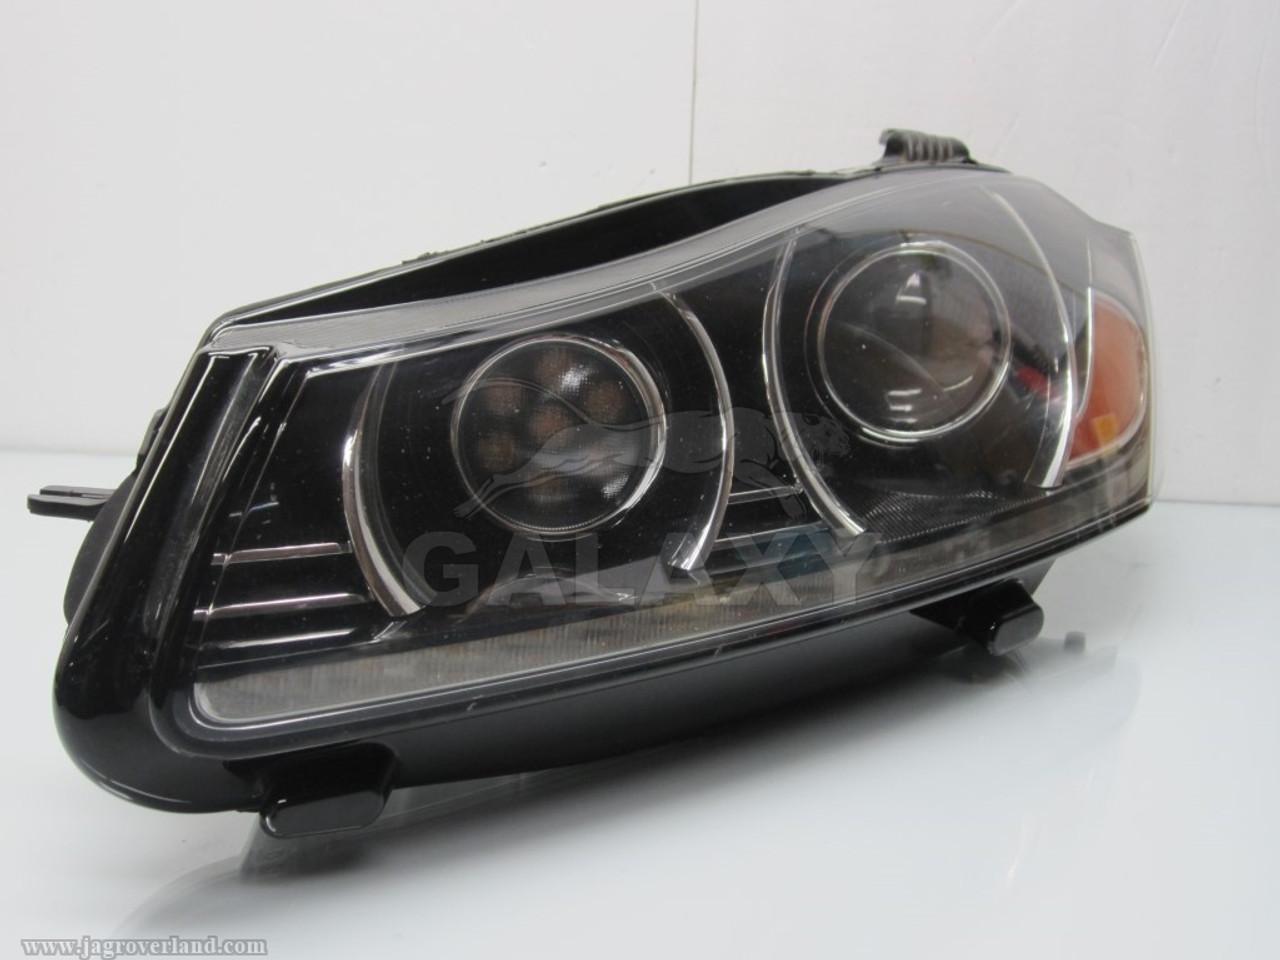 12-15 Xf Oem Driver Left Hid Afs Xenon Adaptive Headlight Headlamp  Cx23-13W030 C2Z31008